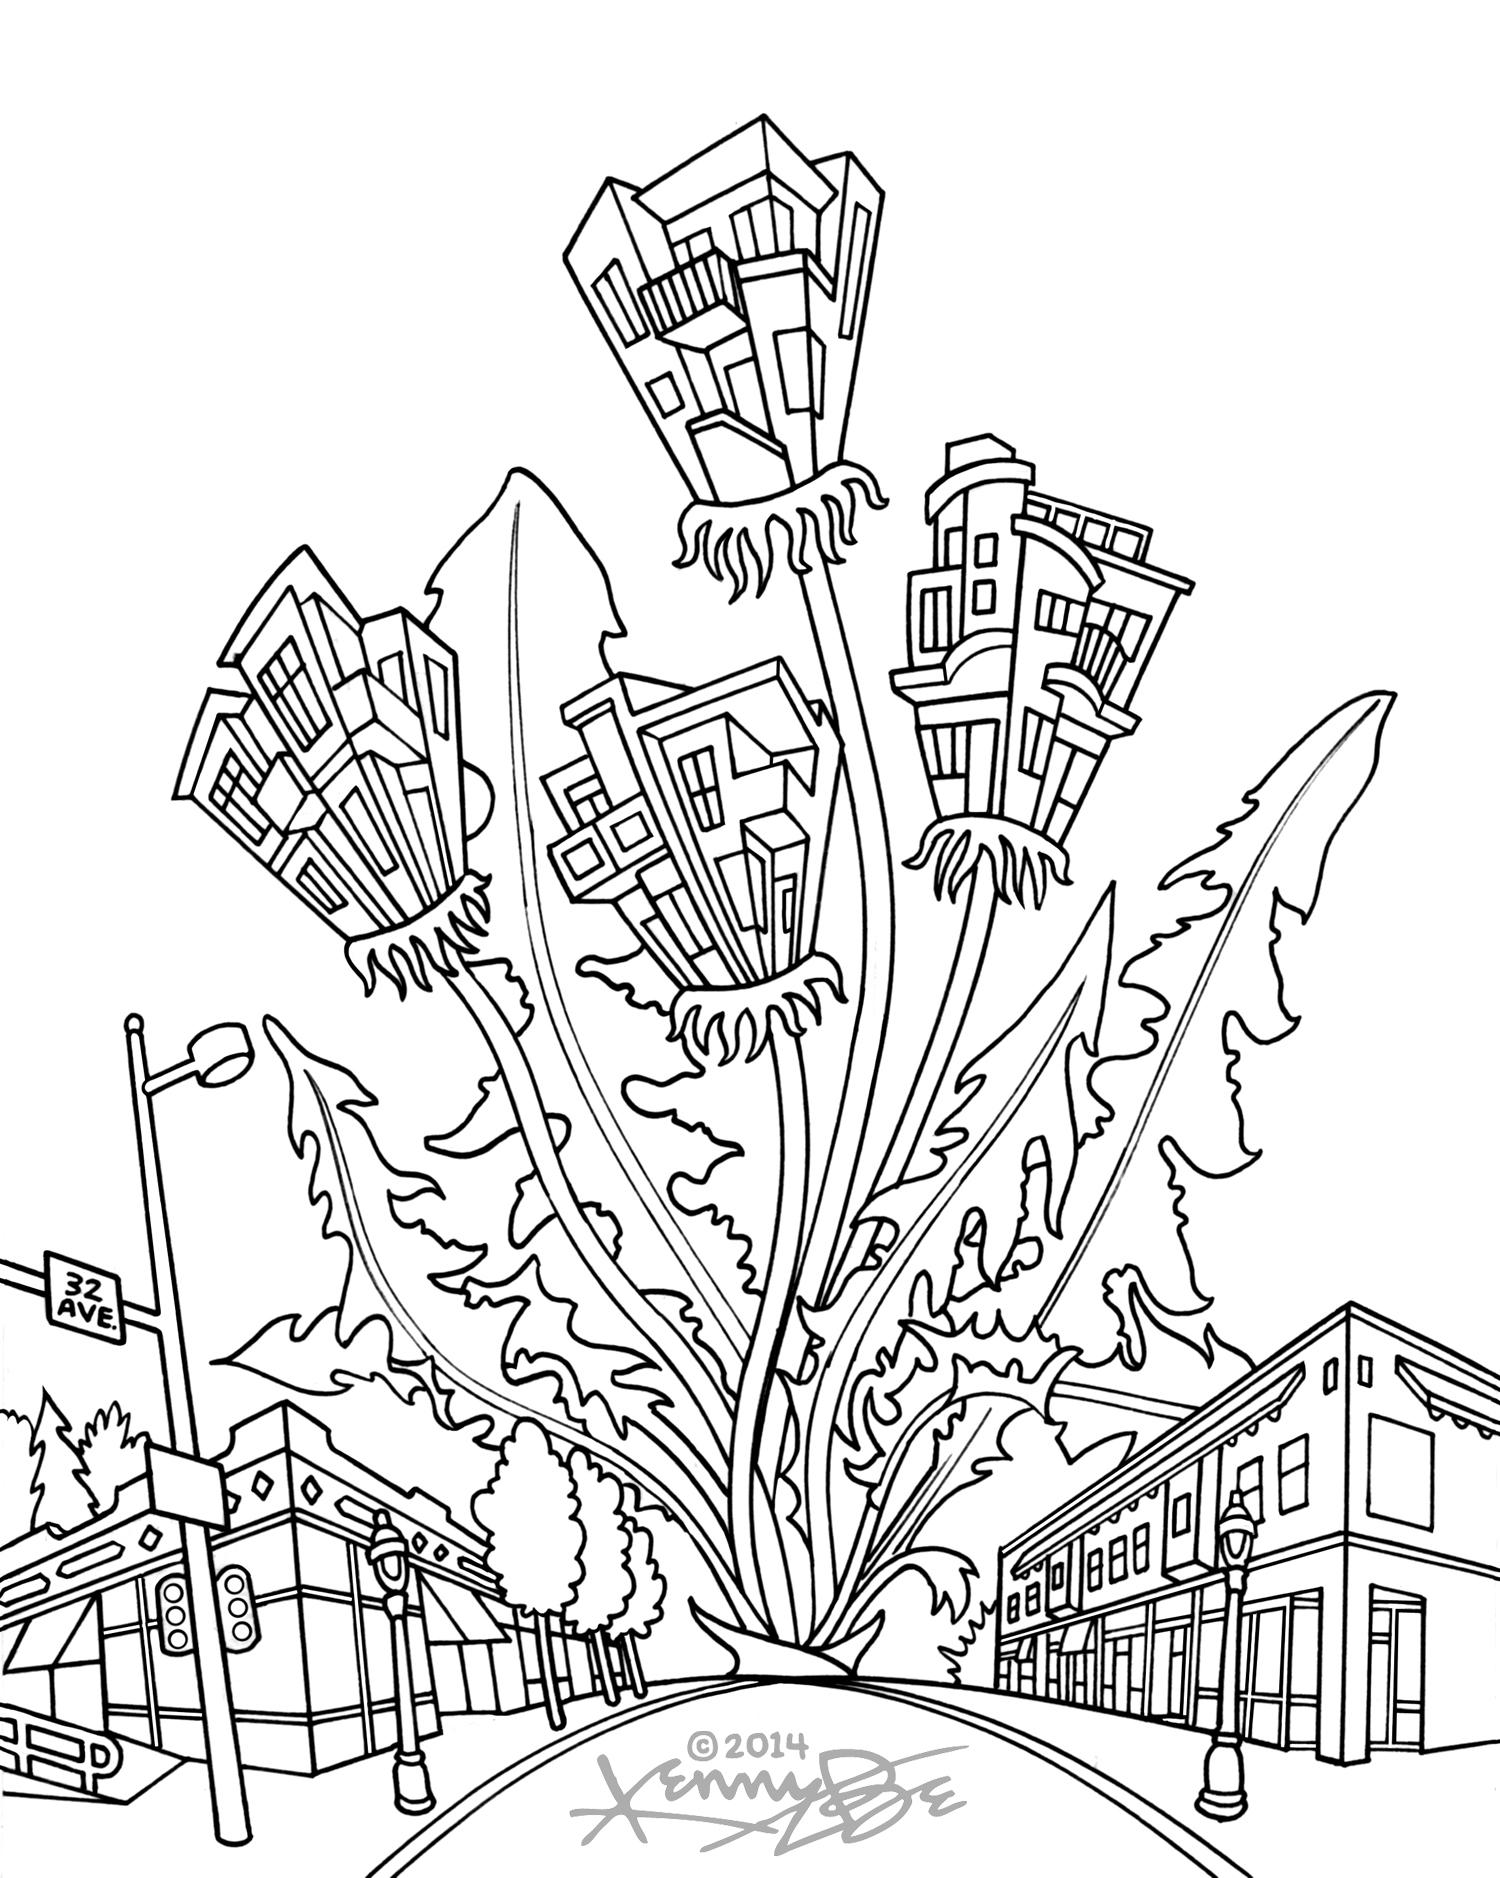 West Highland Dandelion Denver Neighborhood Seed Company 2014 Catalog kennybe.com.jpg